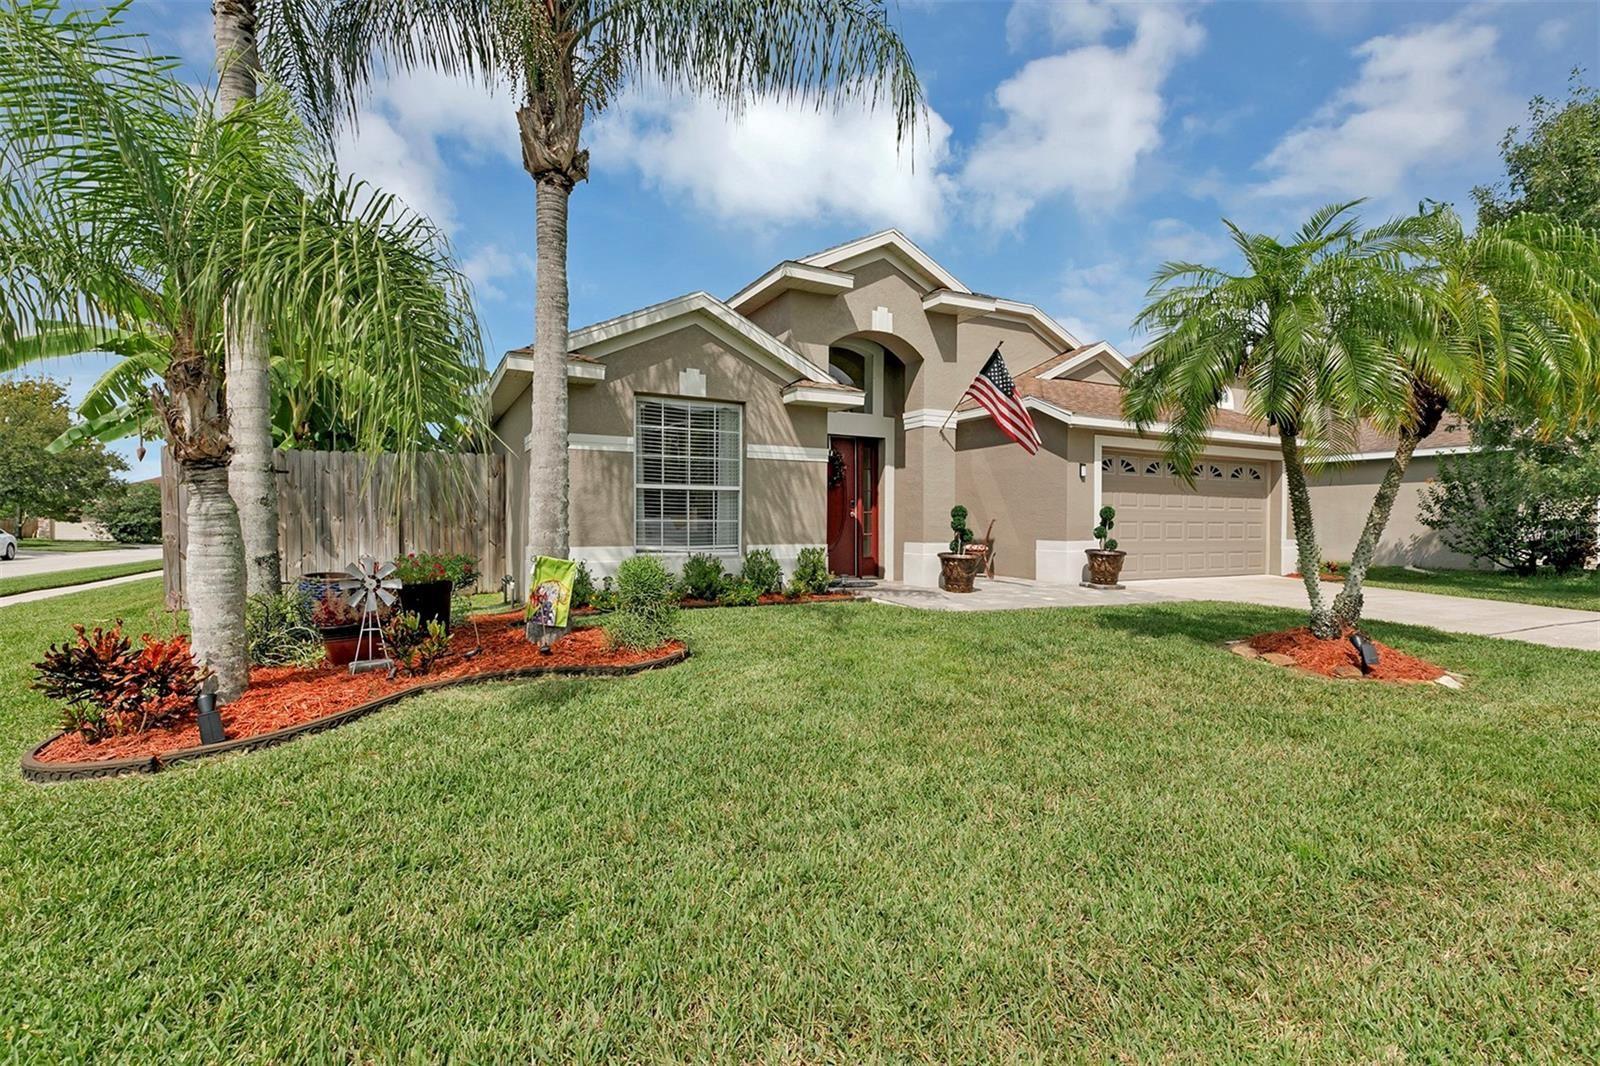 903 LILAC TRACE LANE, Orlando, FL 32828 - #: O5974737